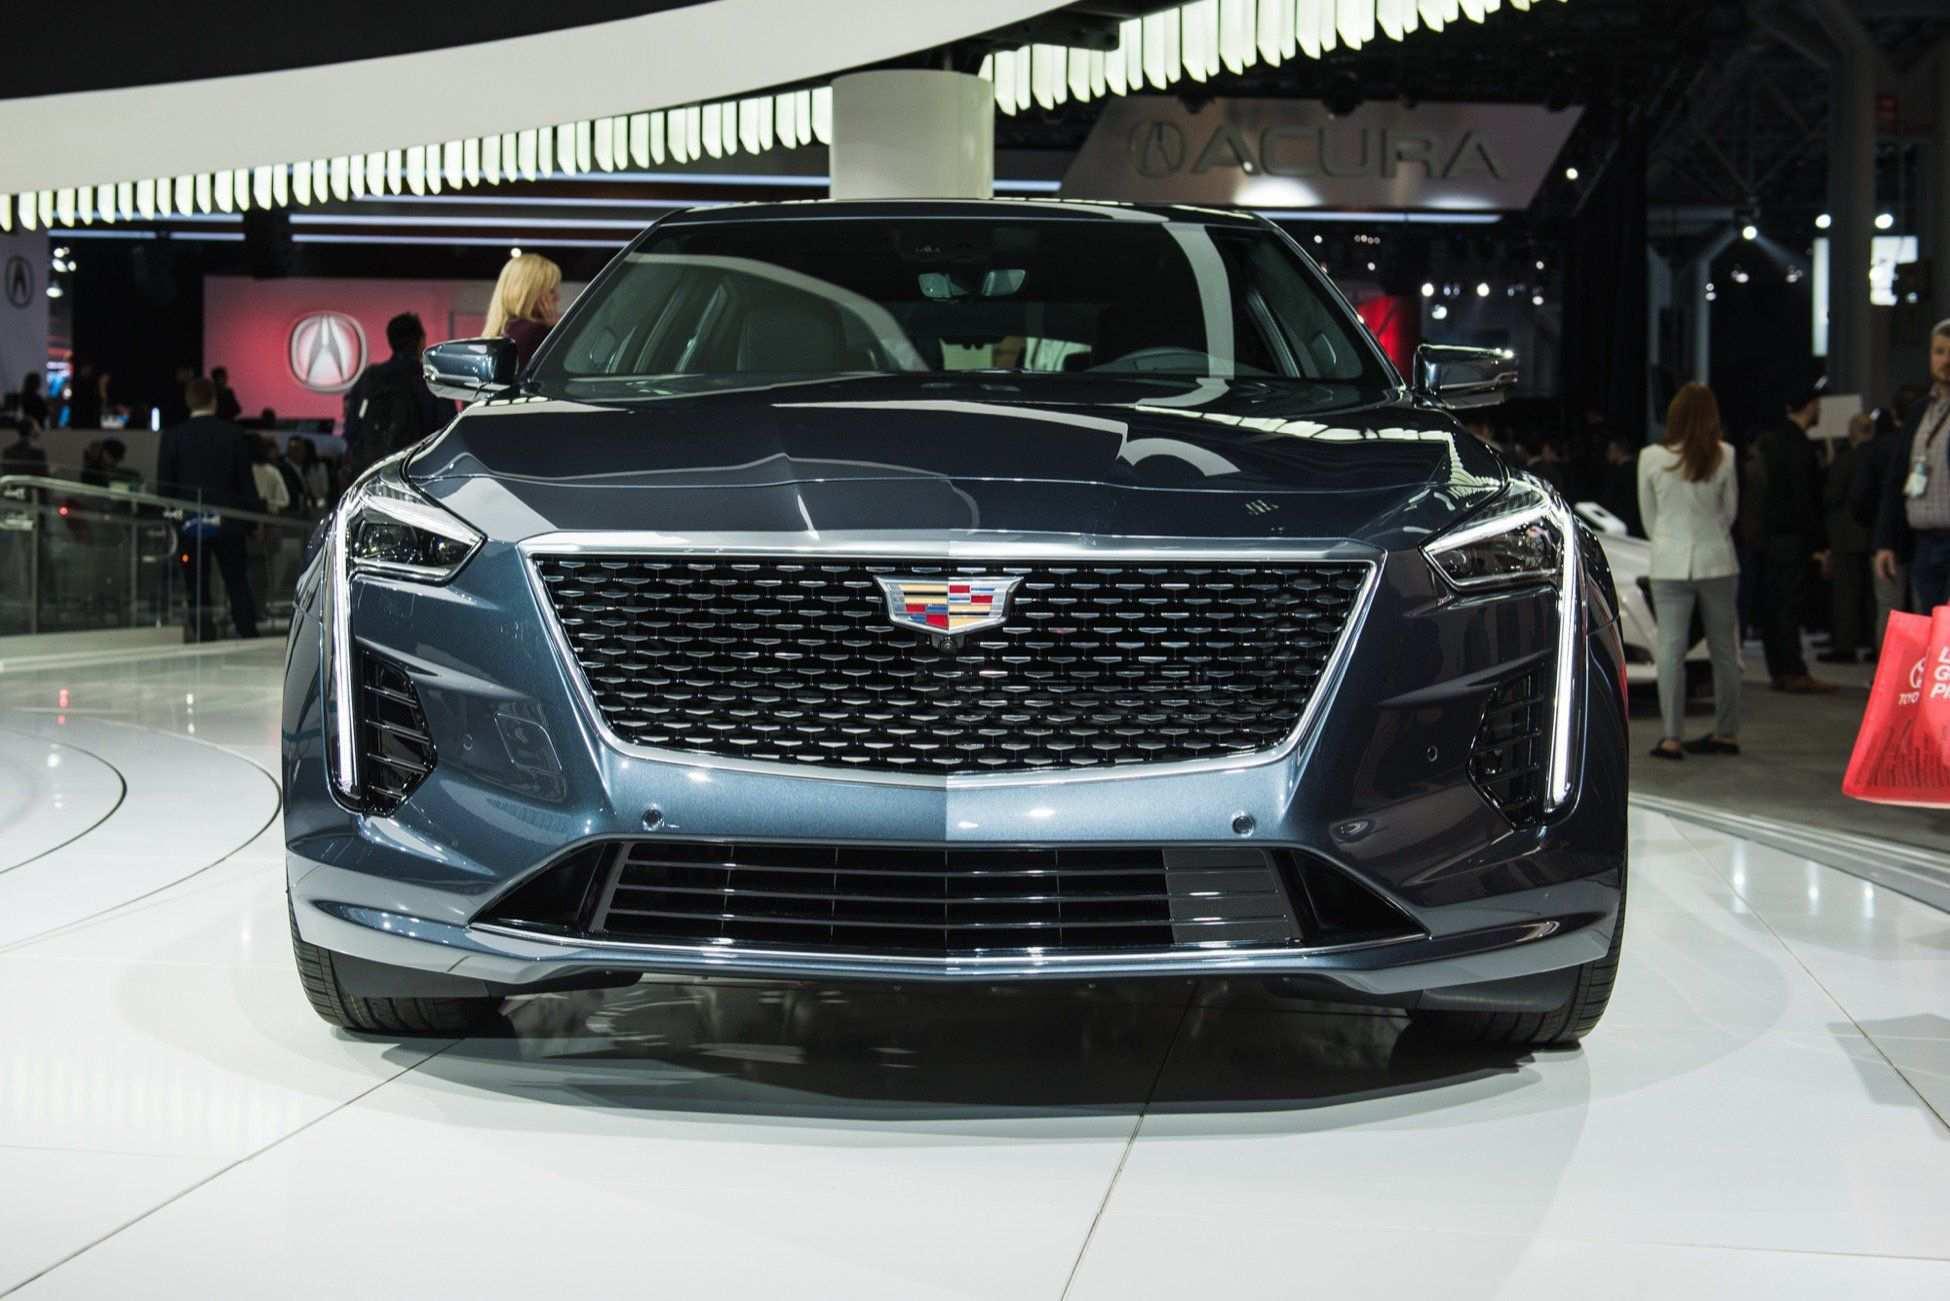 29 Great The Cadillac 2019 Interior Performance Photos by The Cadillac 2019 Interior Performance